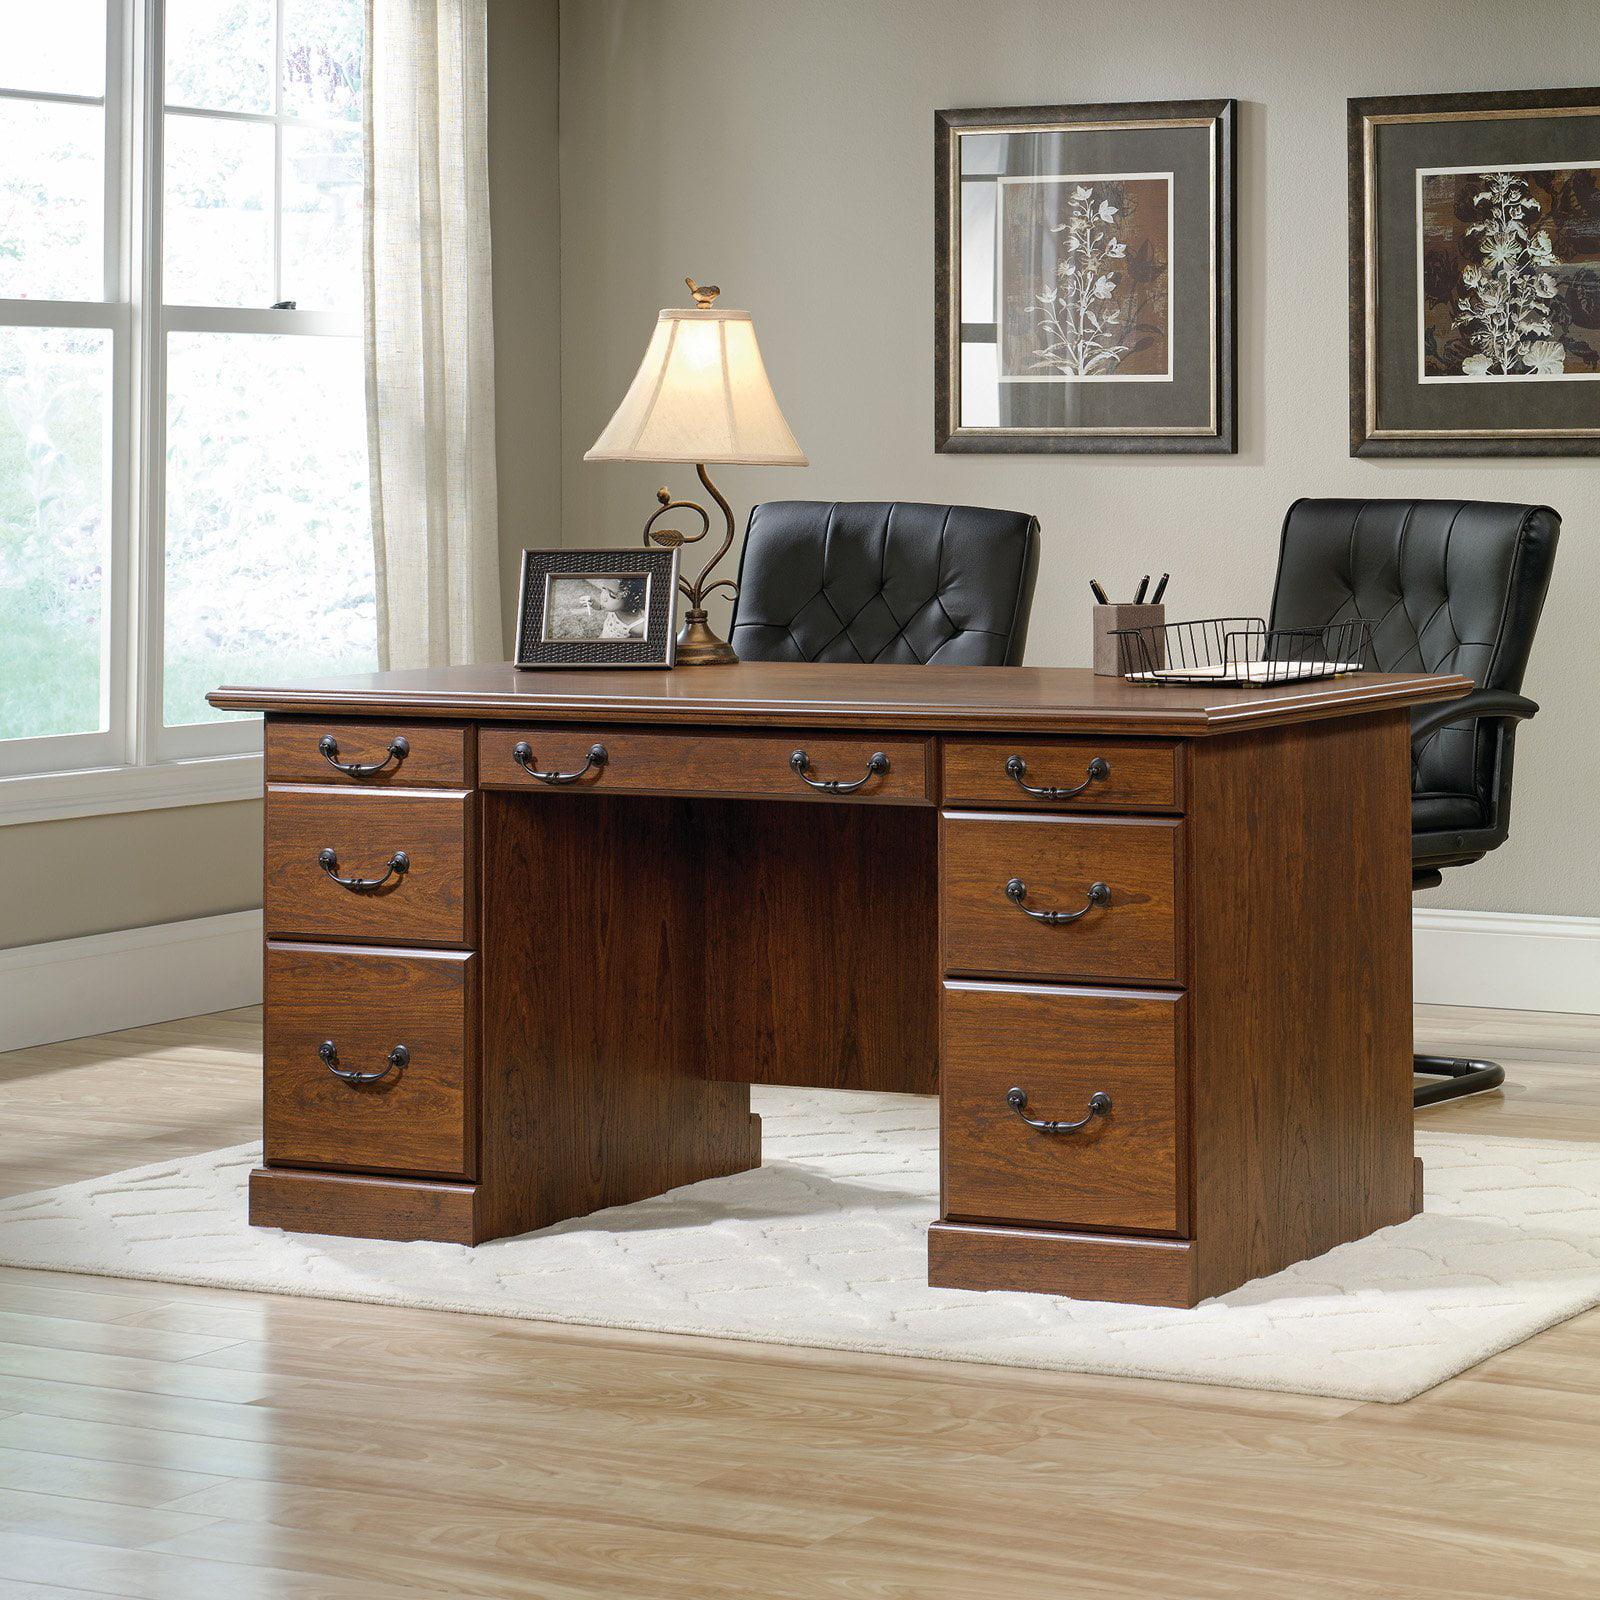 Sauder Orchard Hills Executive Desk Walmart Com